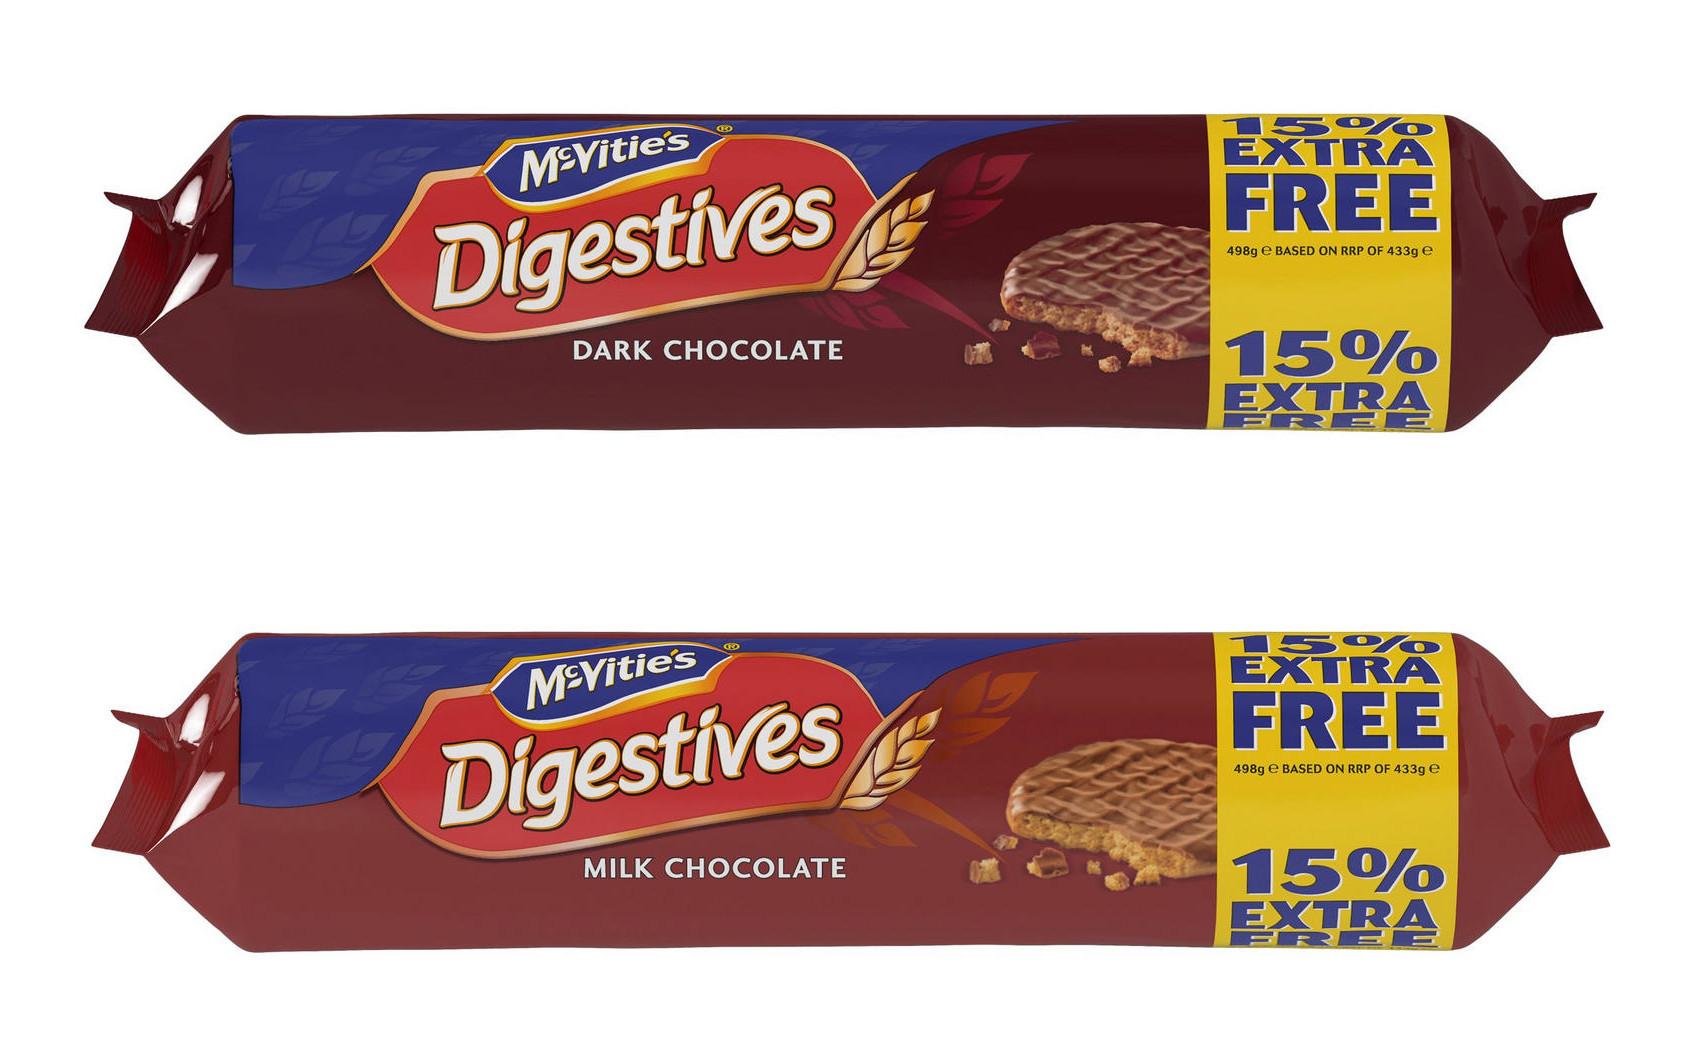 McVitie's Digestives Milk or Dark Chocolate 498g (15% extra) for £1 @ Iceland